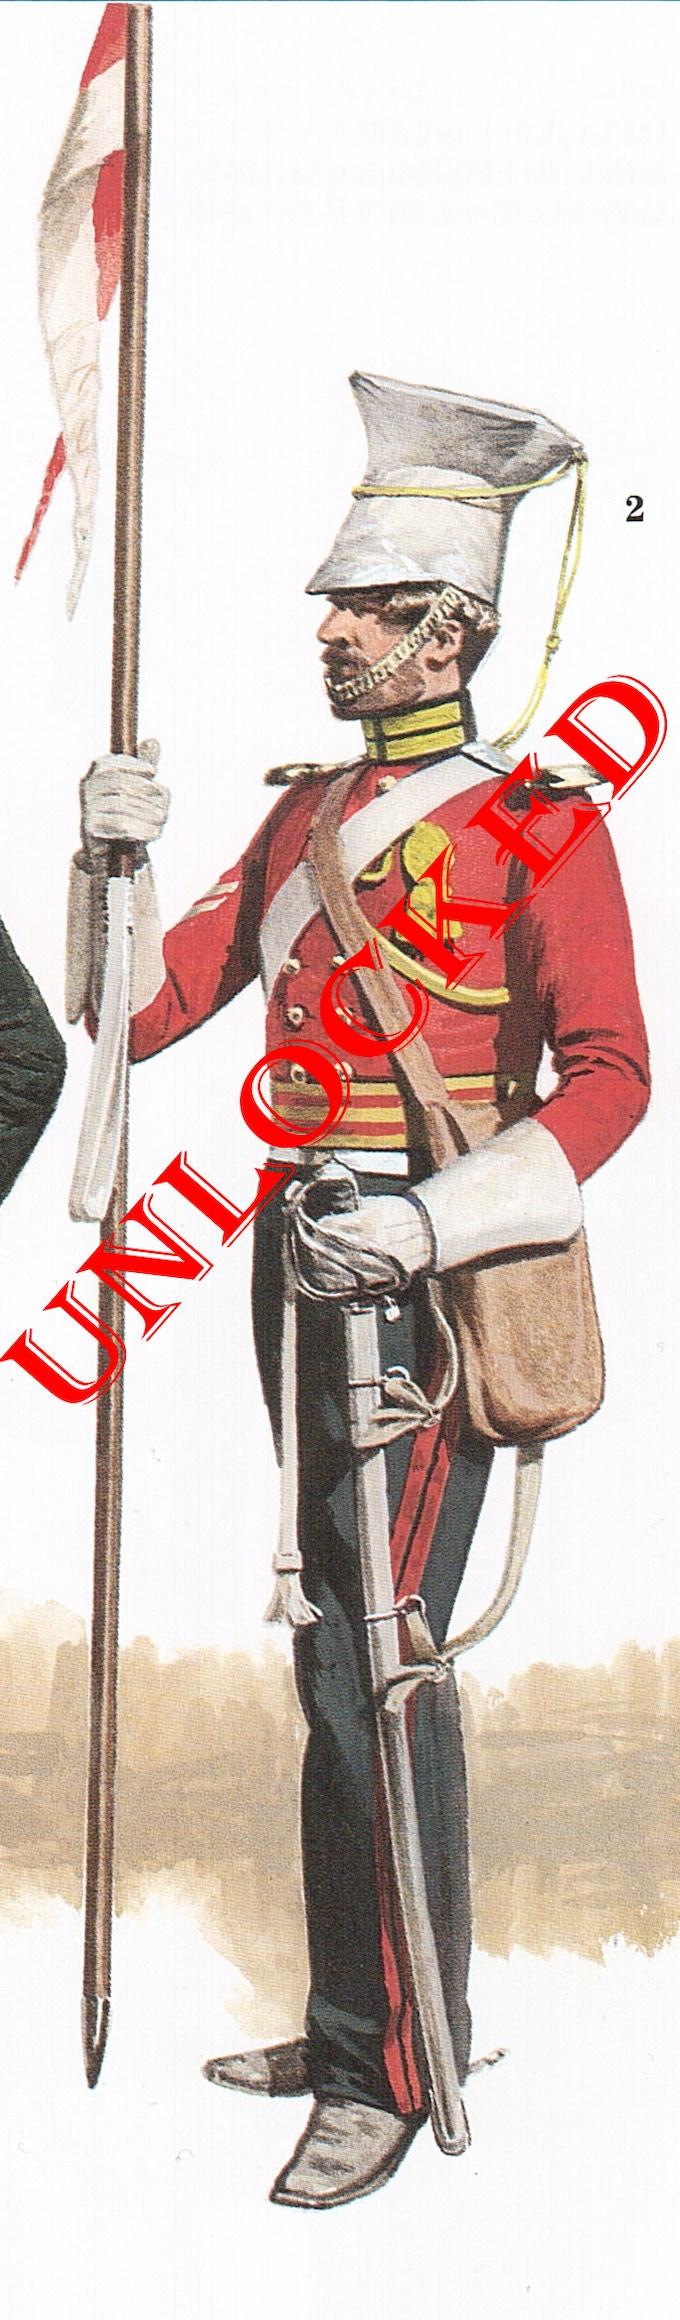 British Lancer by P Turner. Copyright Osprey Publishing Ltd